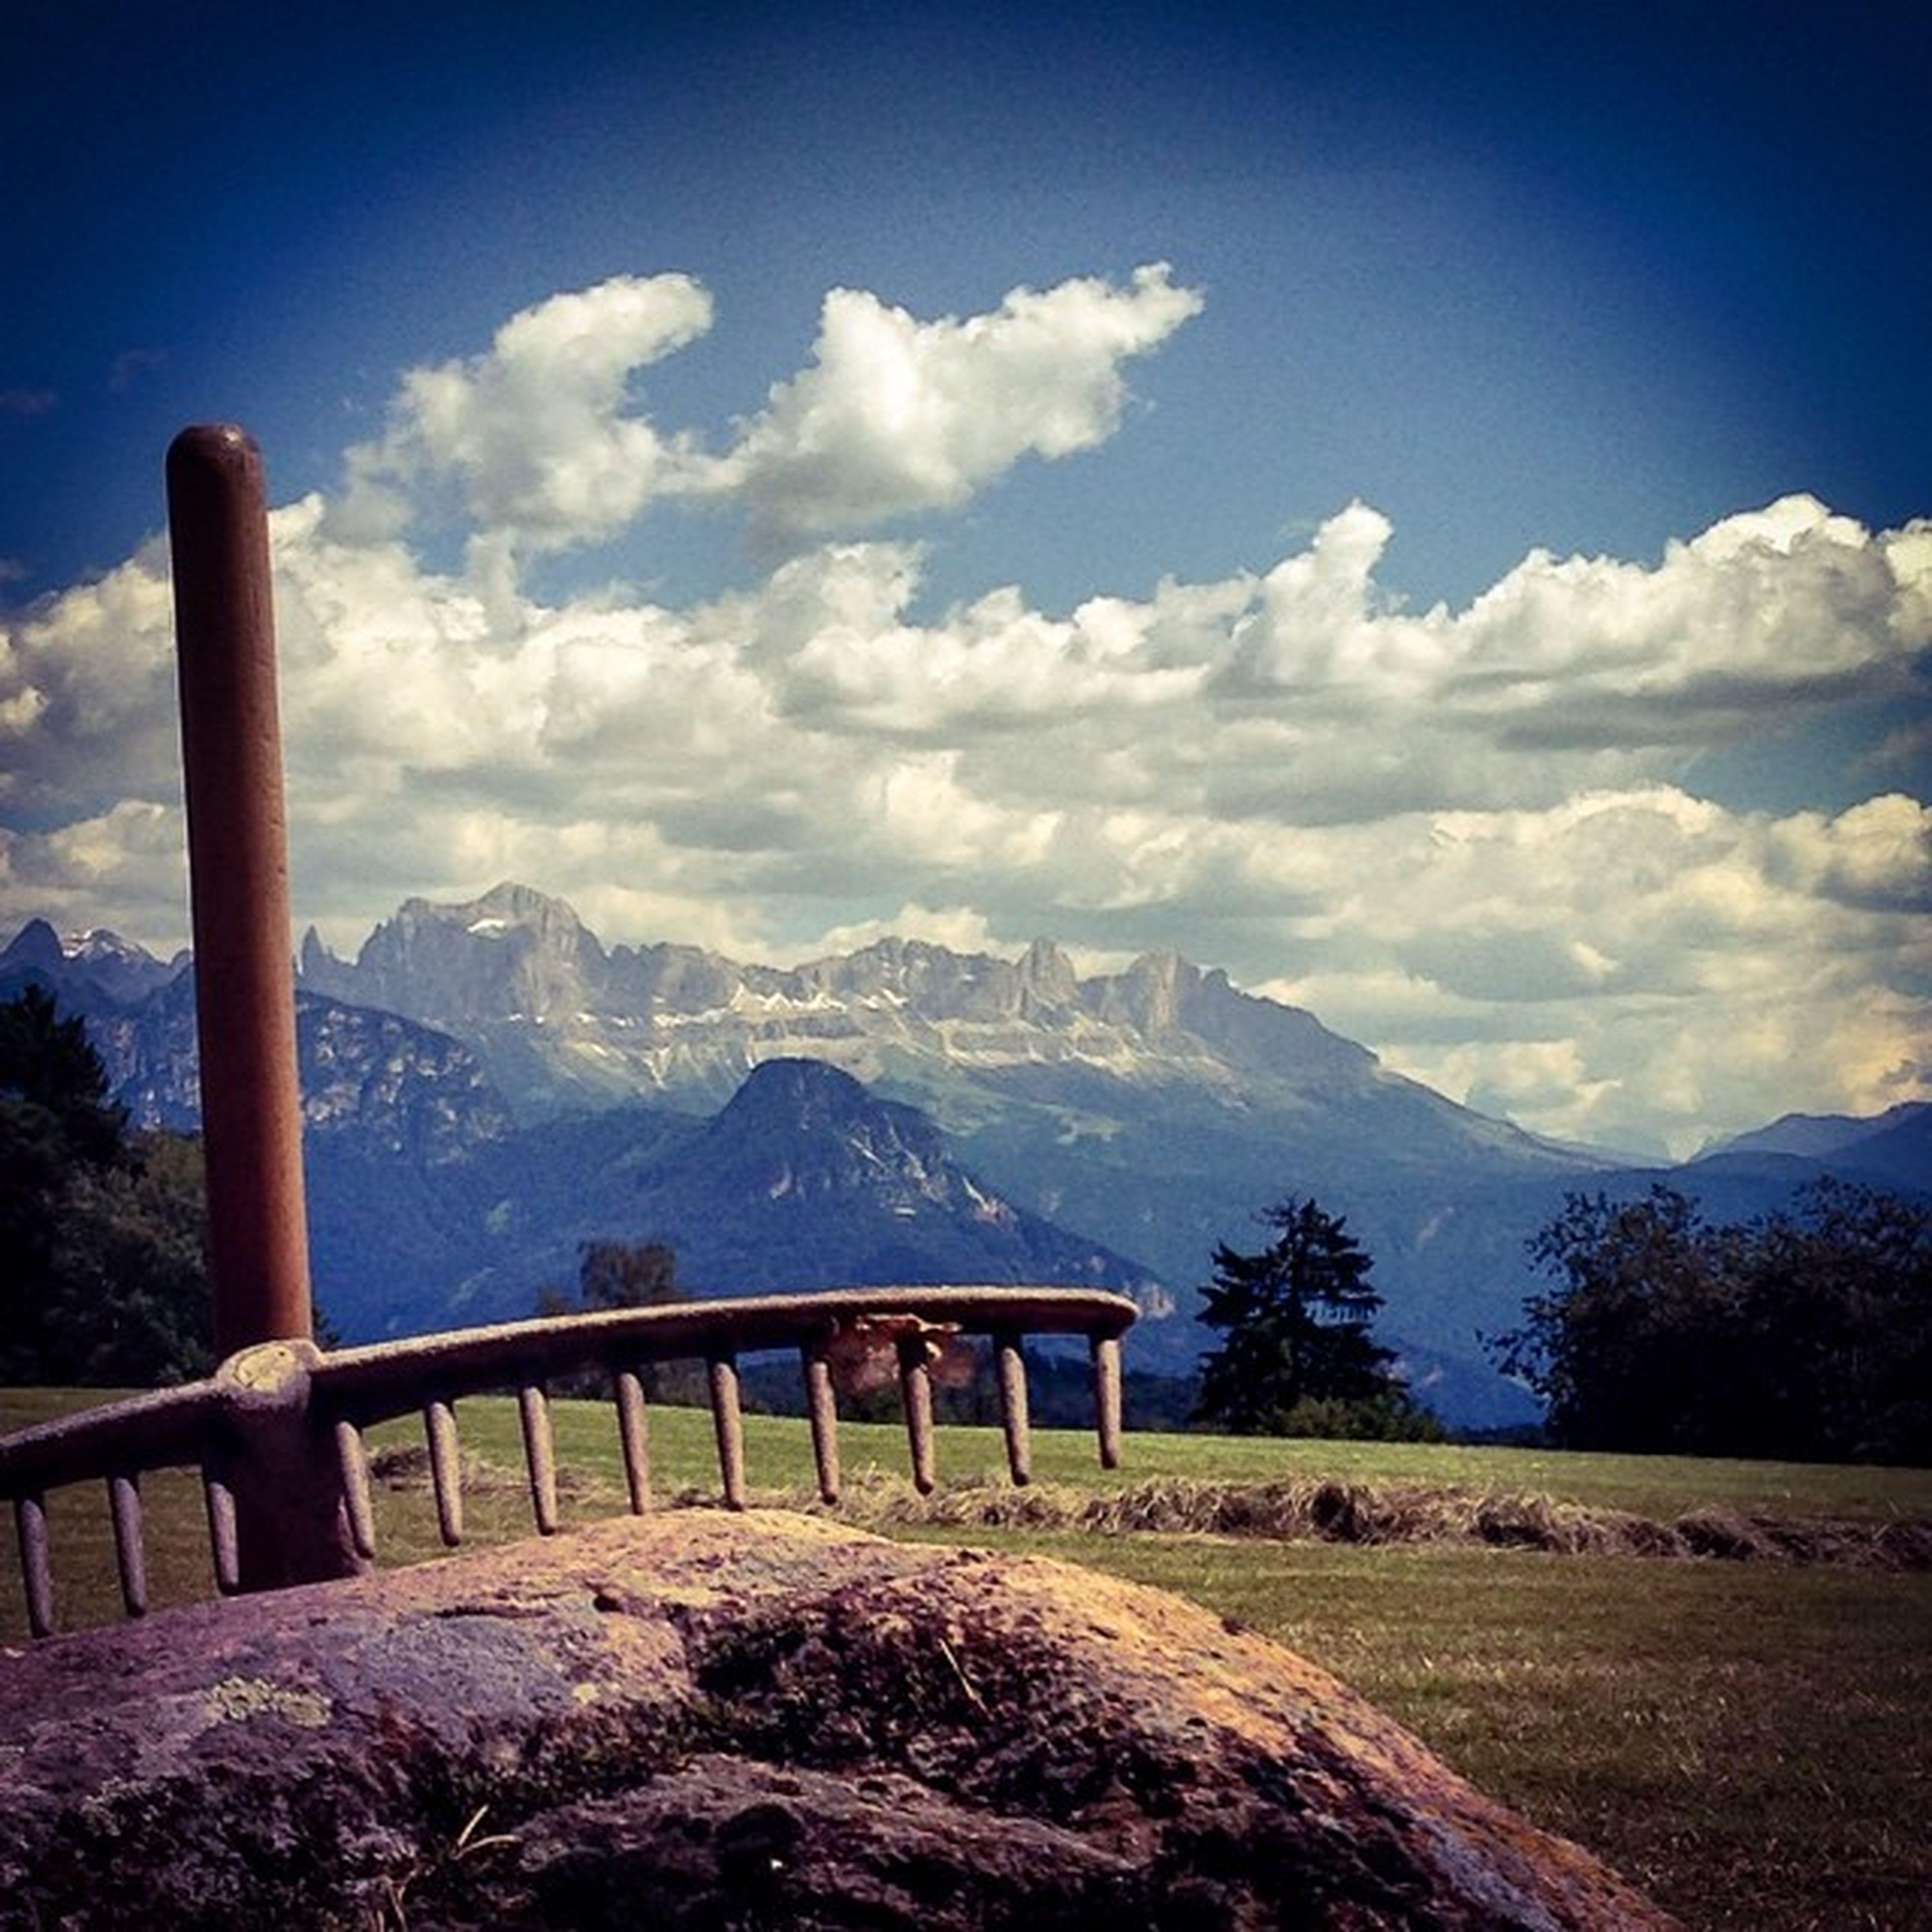 mountain, mountain range, tranquil scene, sky, tranquility, landscape, scenics, beauty in nature, nature, cloud - sky, cloud, non-urban scene, tree, idyllic, snow, day, field, winter, sunlight, remote